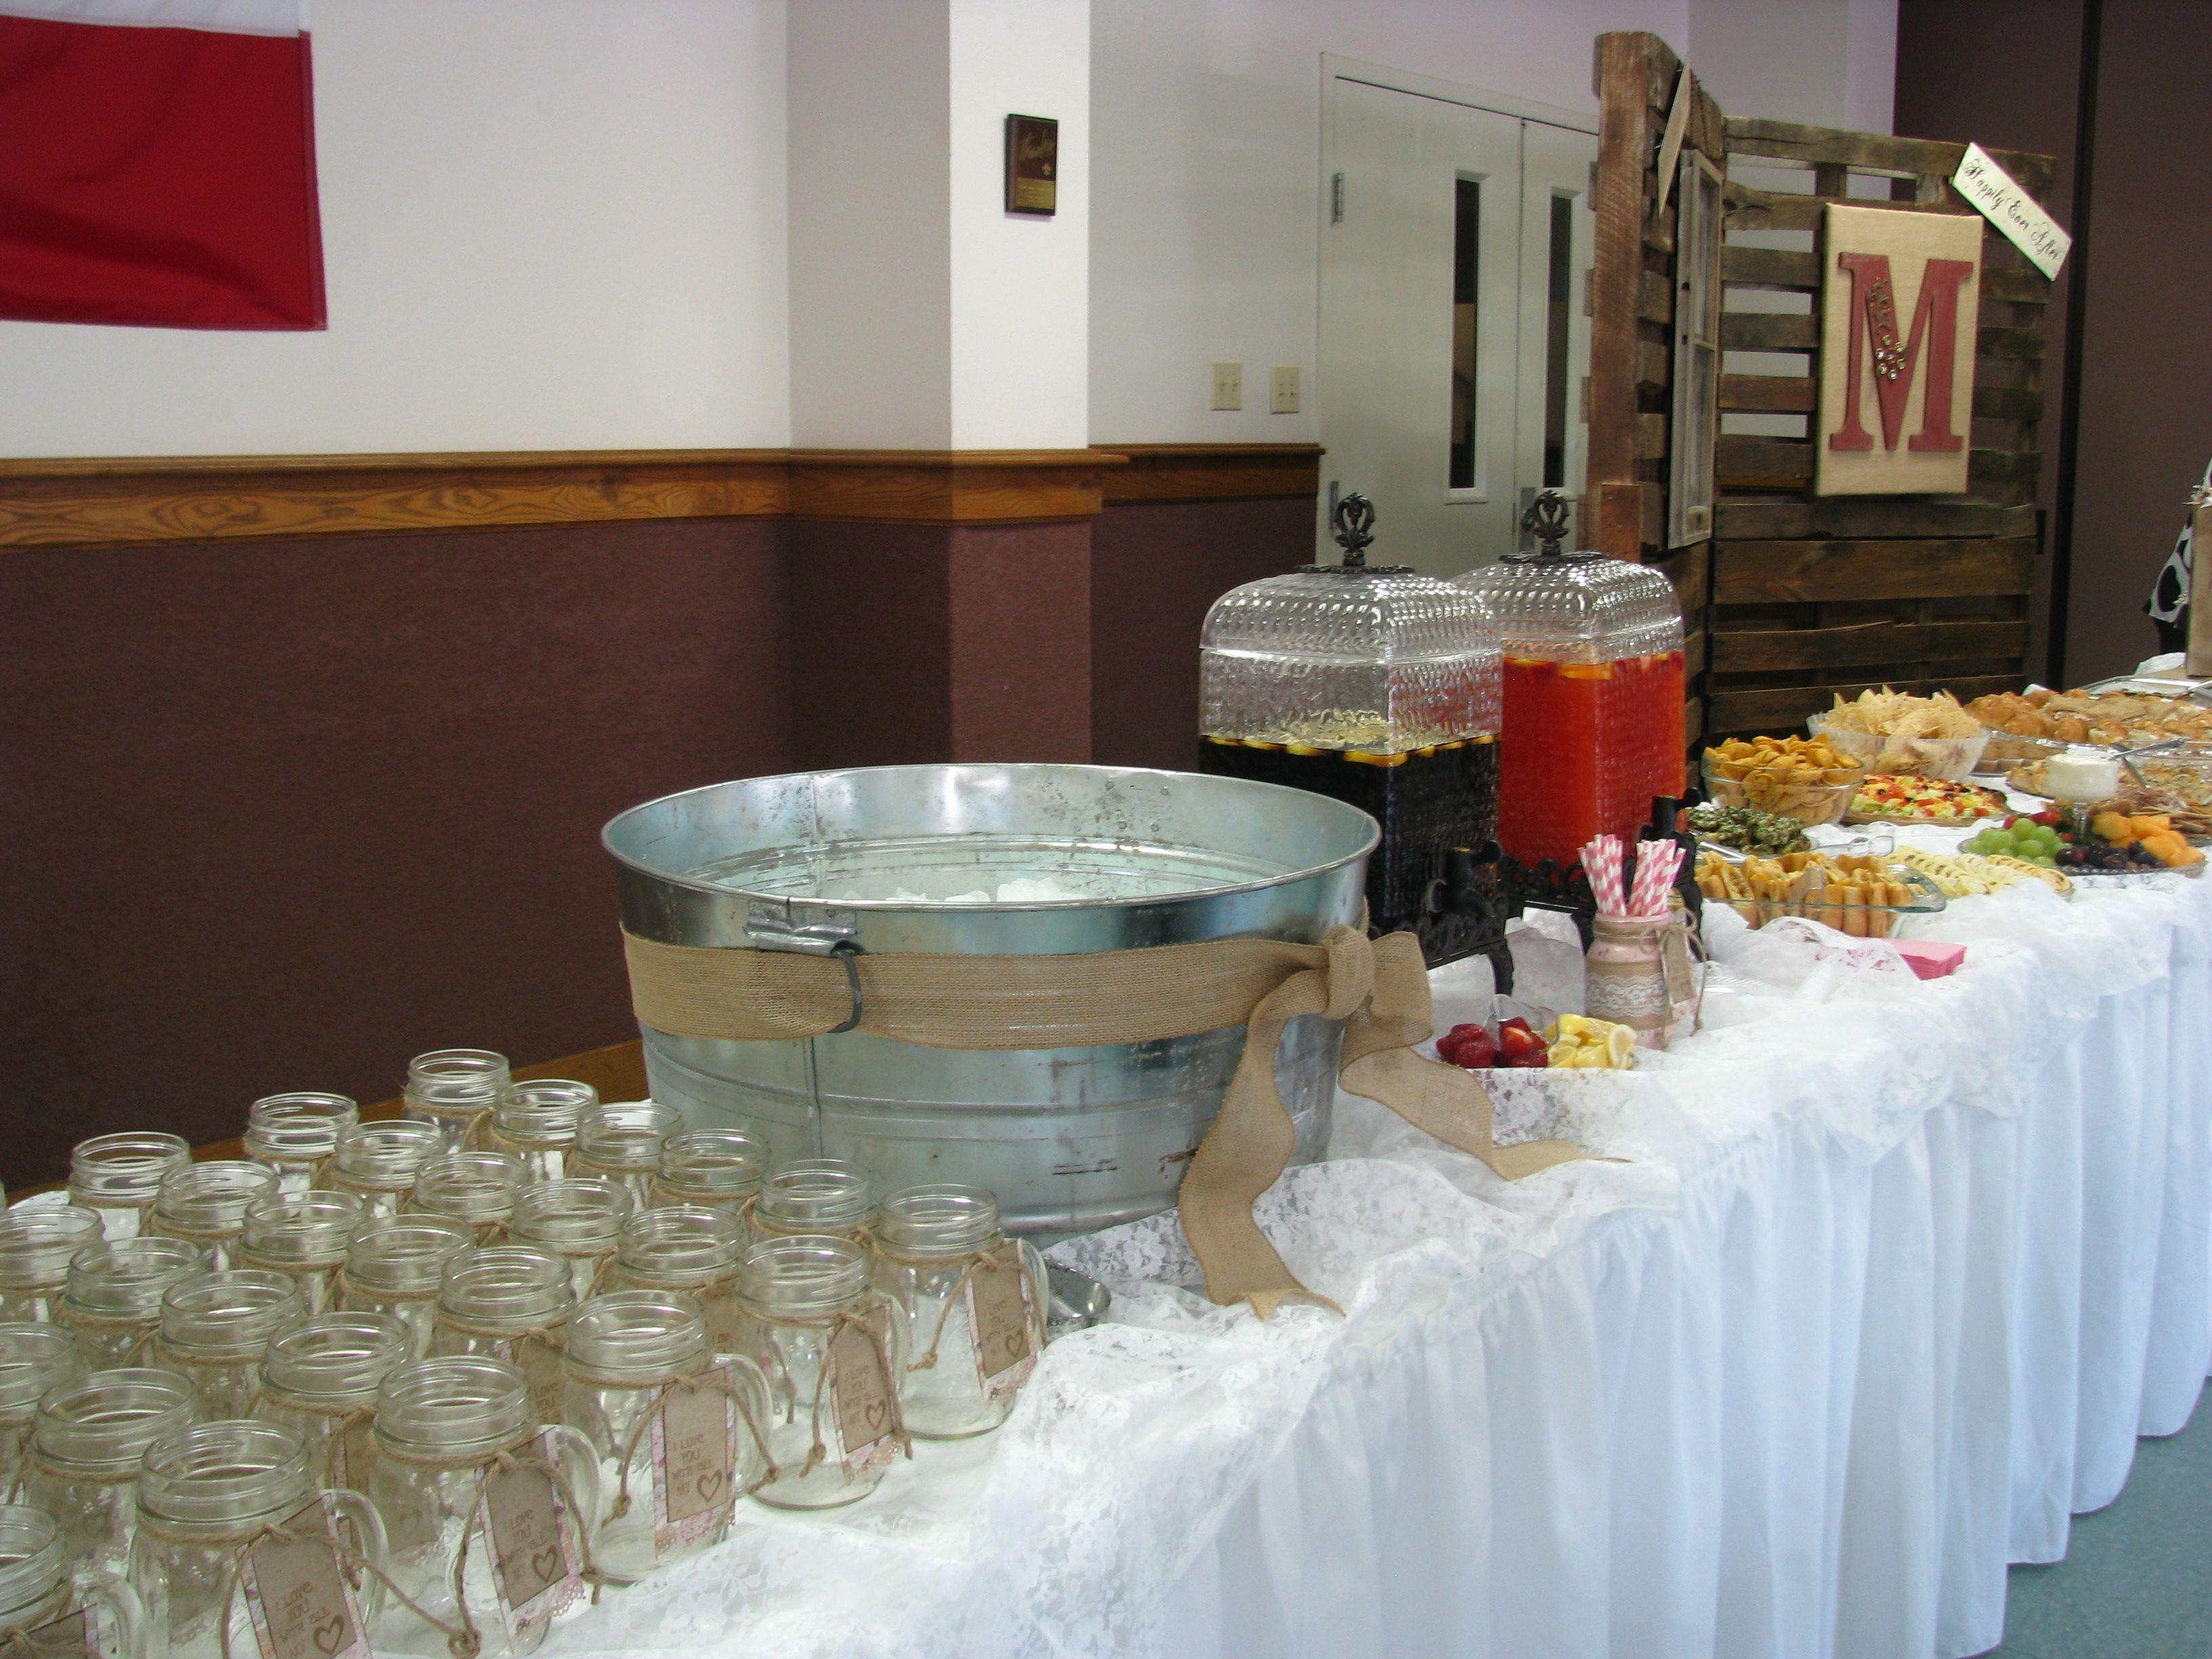 Pinterest Wedding Shower: Banquest, Parties, Showers, Etc